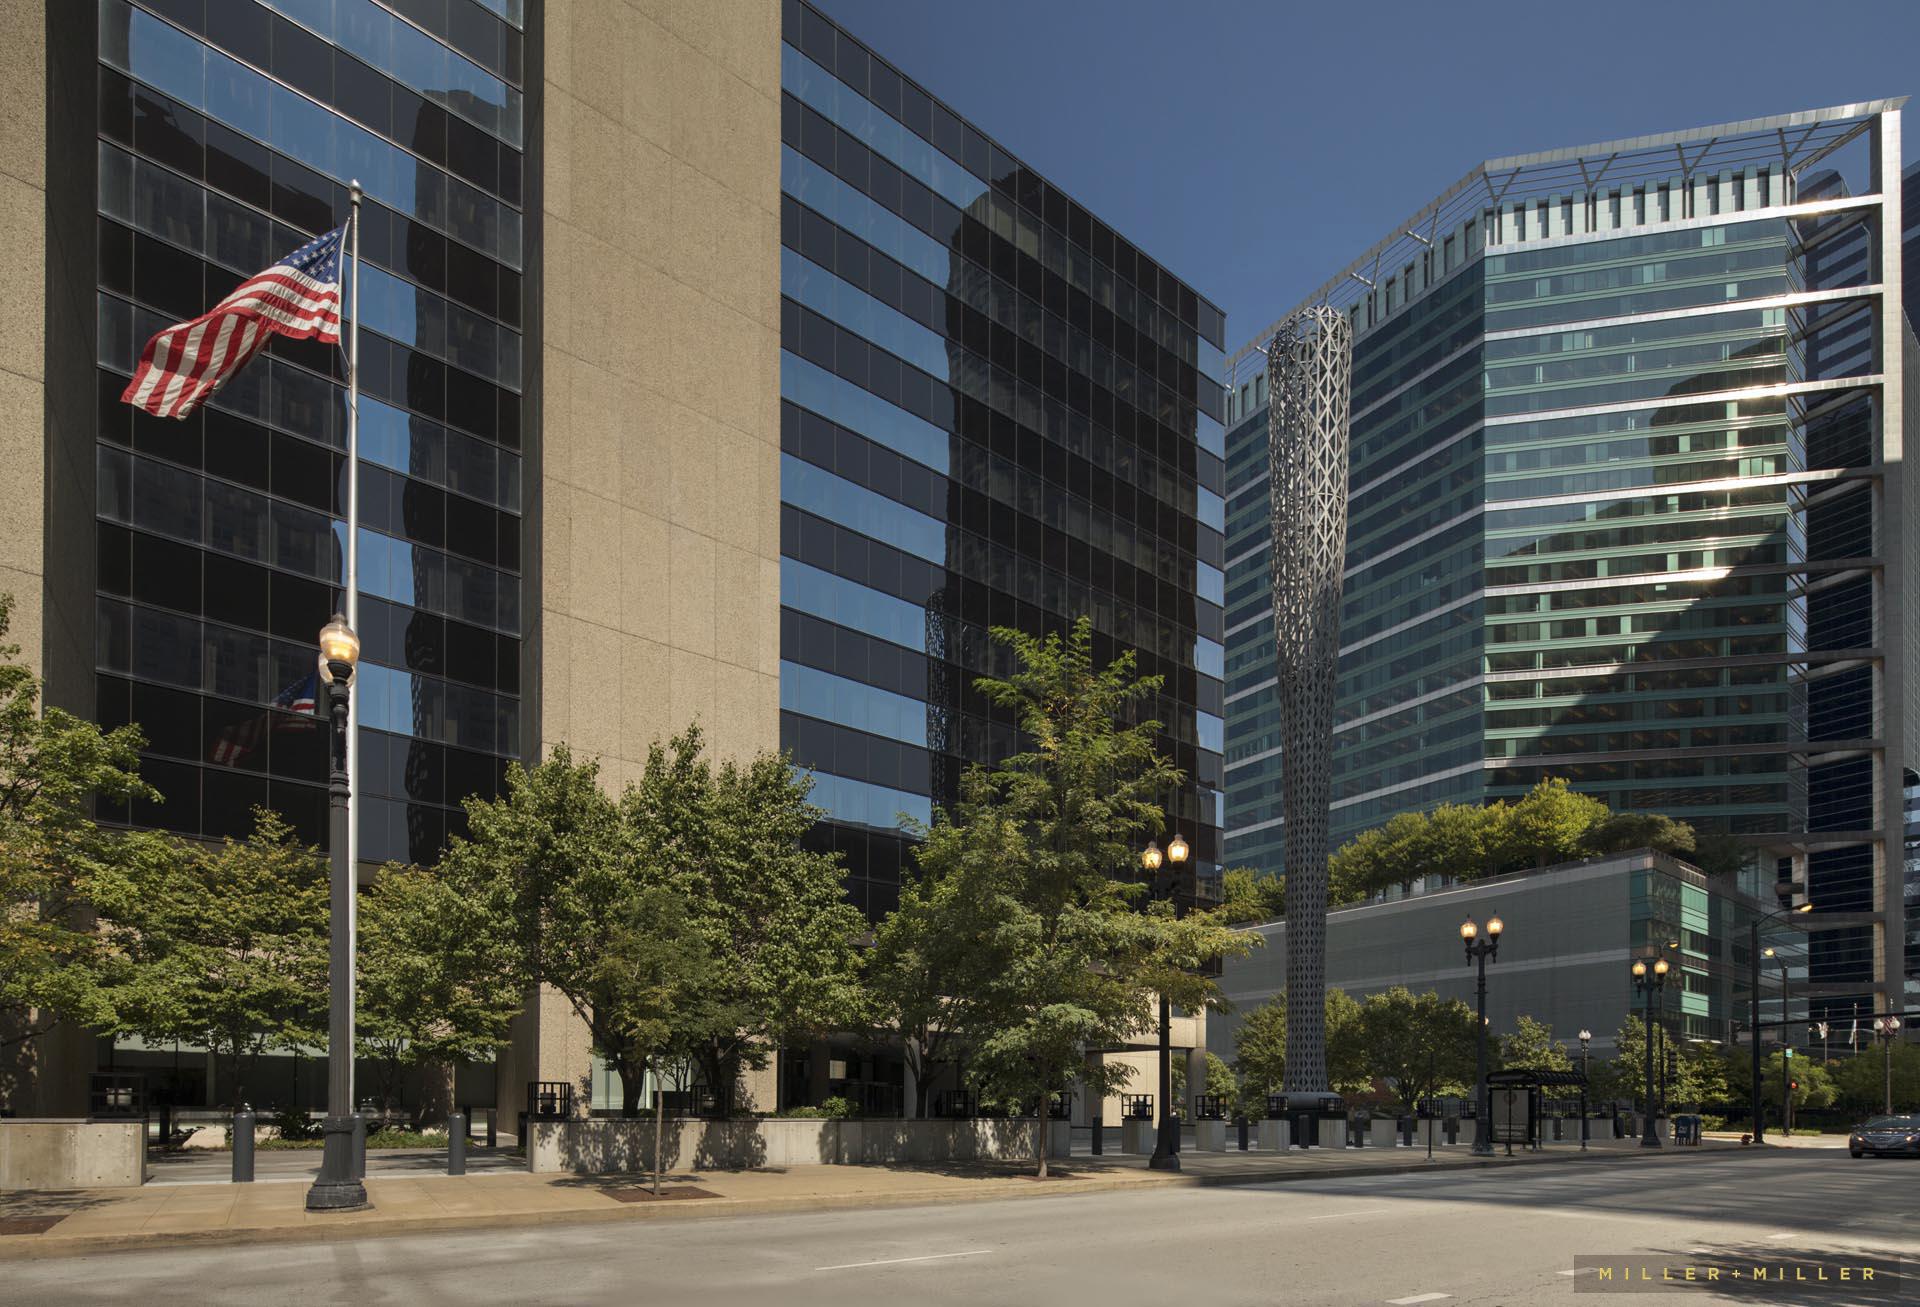 chicago-harold-washington-social-security-building-renovation